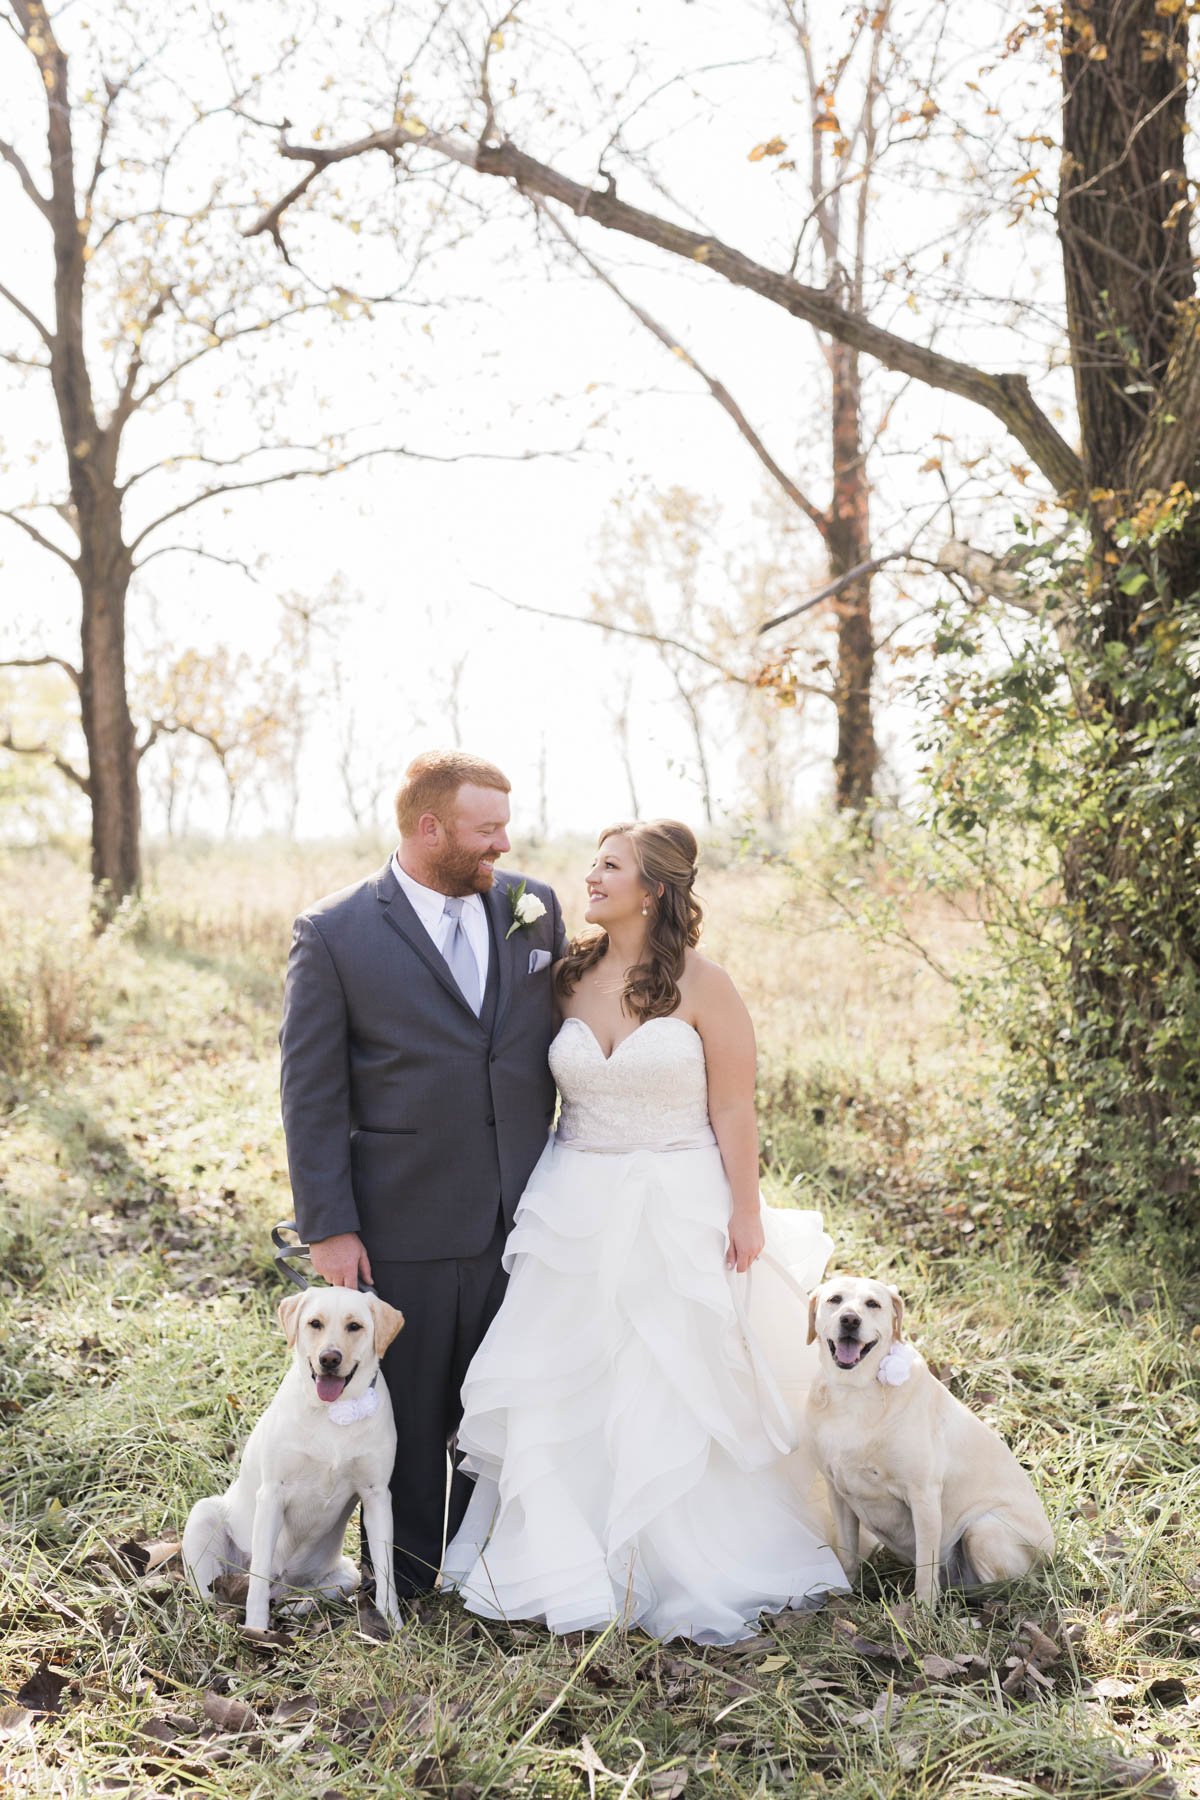 shotbychelsea_wedding_photography_blog-14.jpg